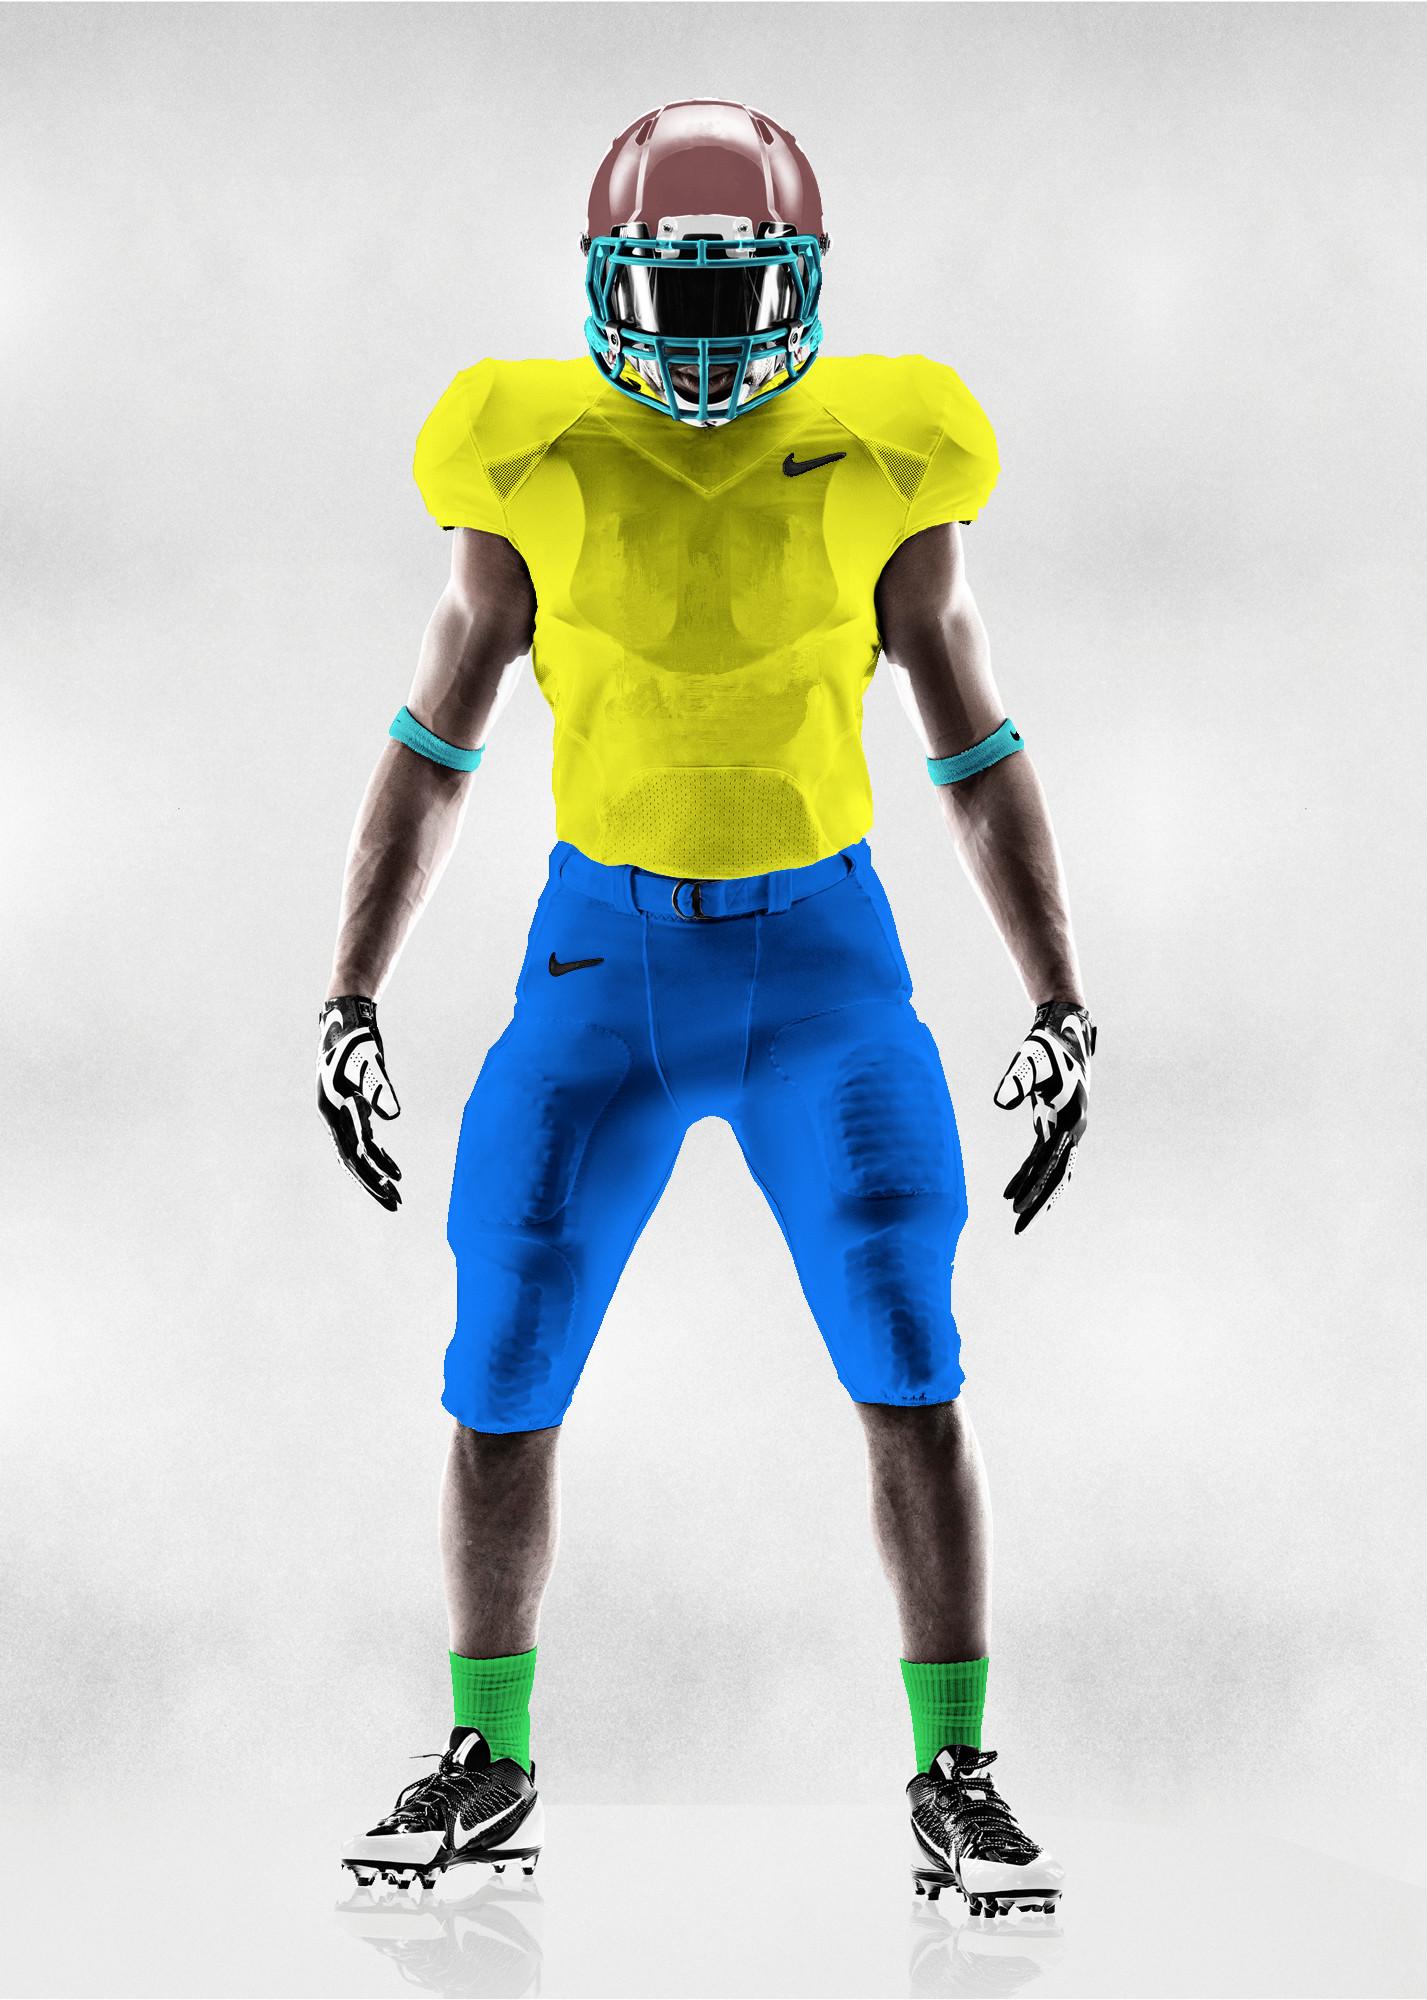 Nike Football Jersey Template Nike Football Uniform Template by Nextgen10 On Deviantart